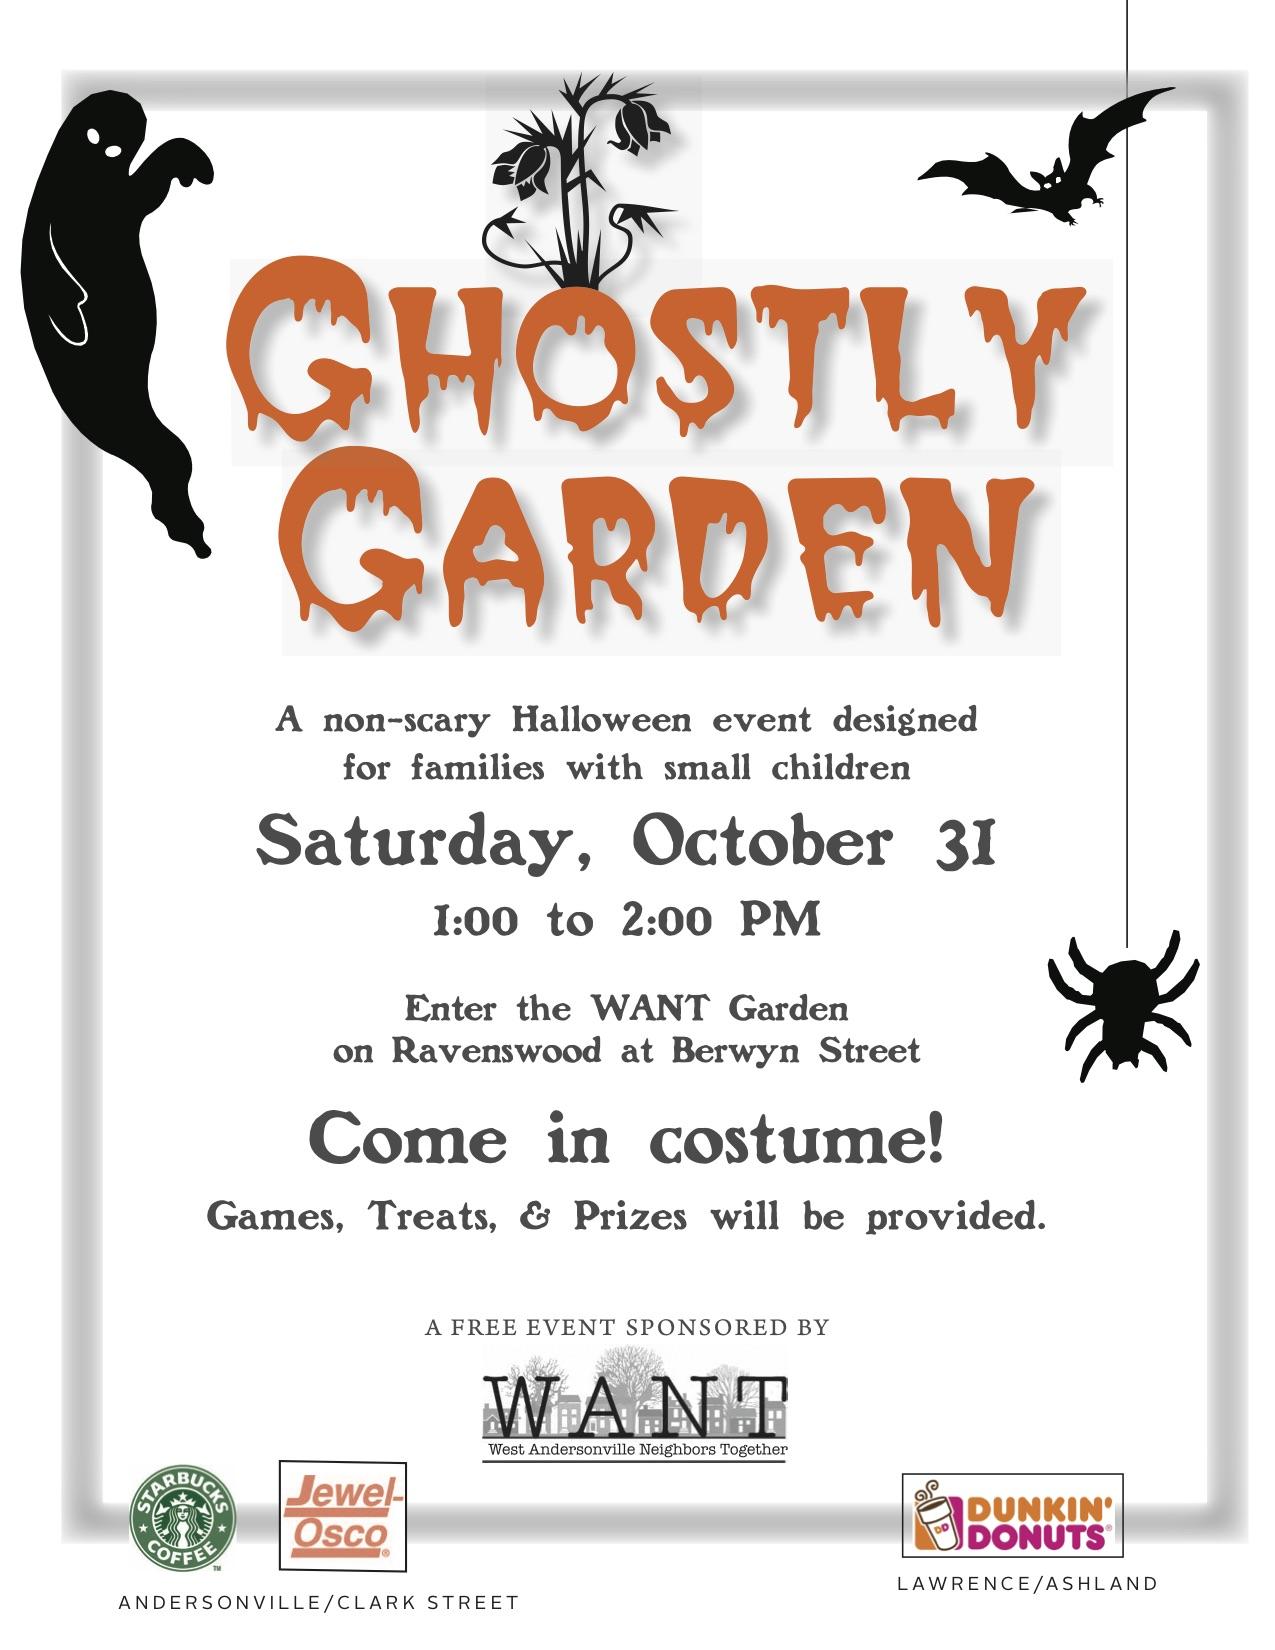 Ghostly Garden Flyer outlines